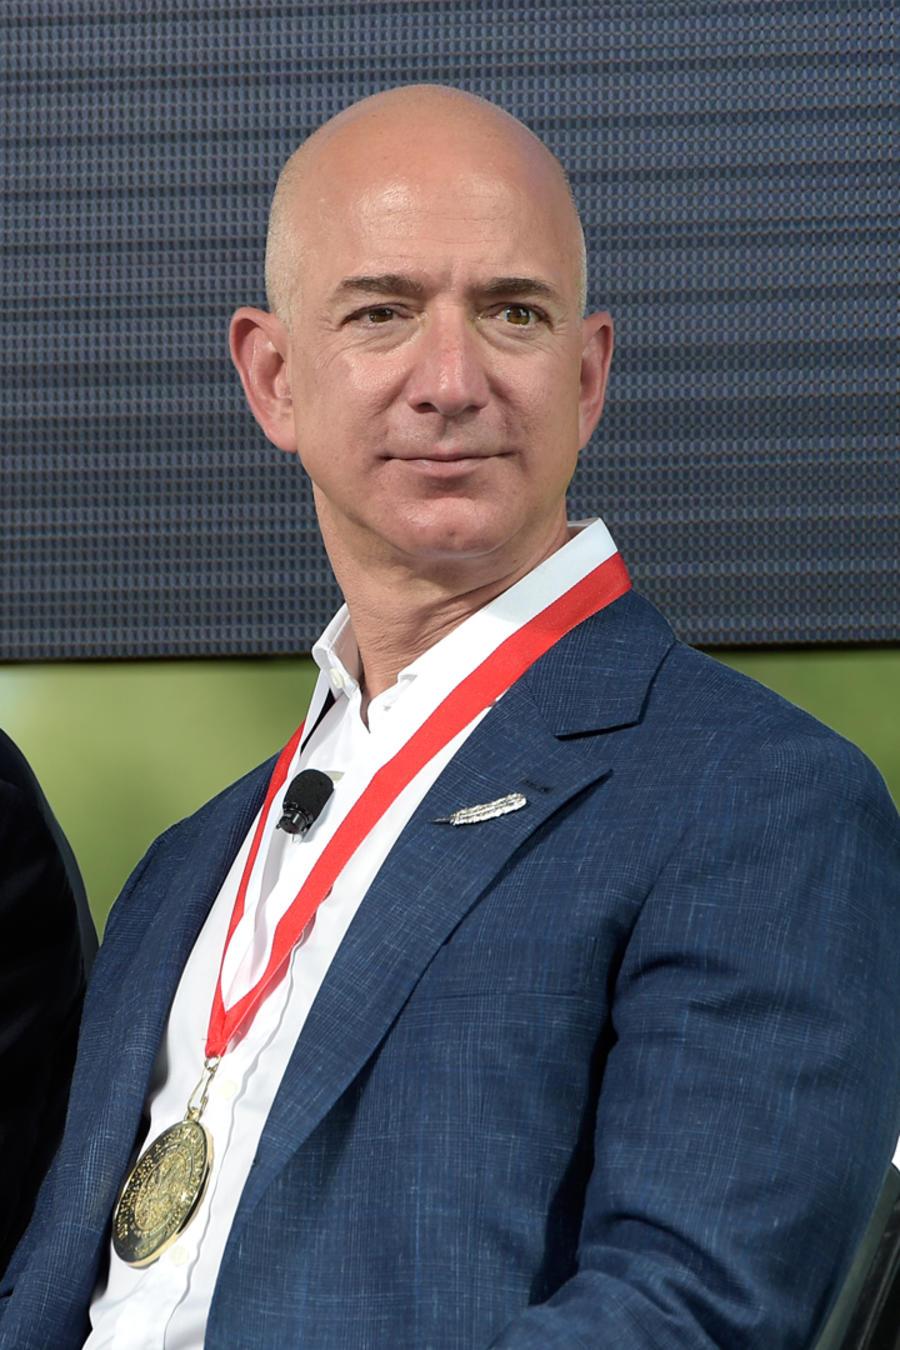 Billonarios: Bill Gates, Mark Zuckerberg, Jeff Bezos